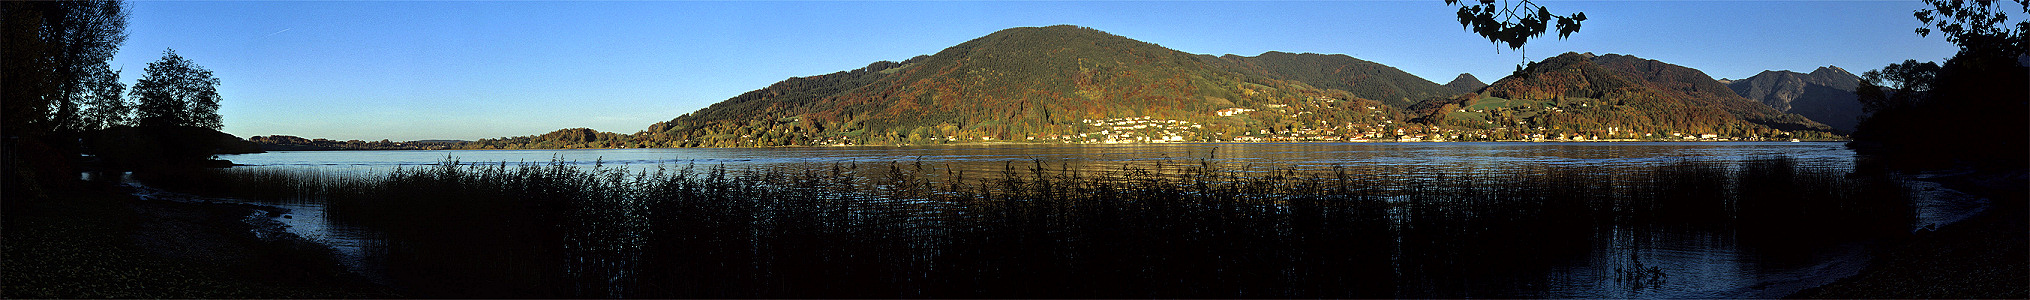 Bad Wiessee Tegernsee